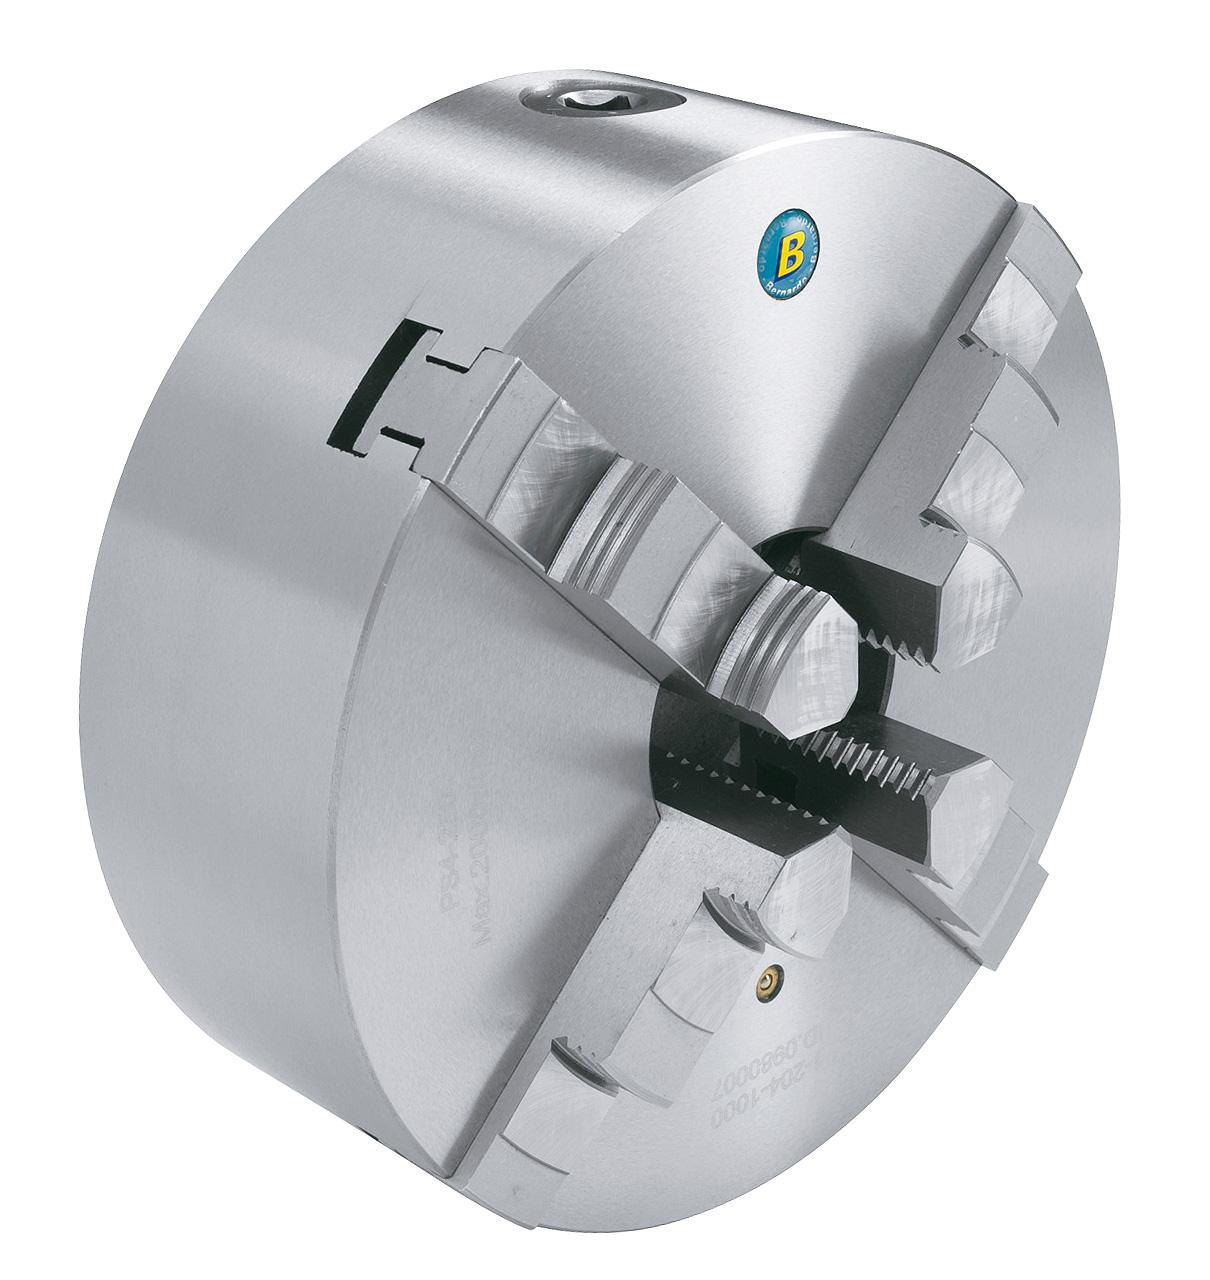 4 bakket centrerpatron standard DK12-400/D11